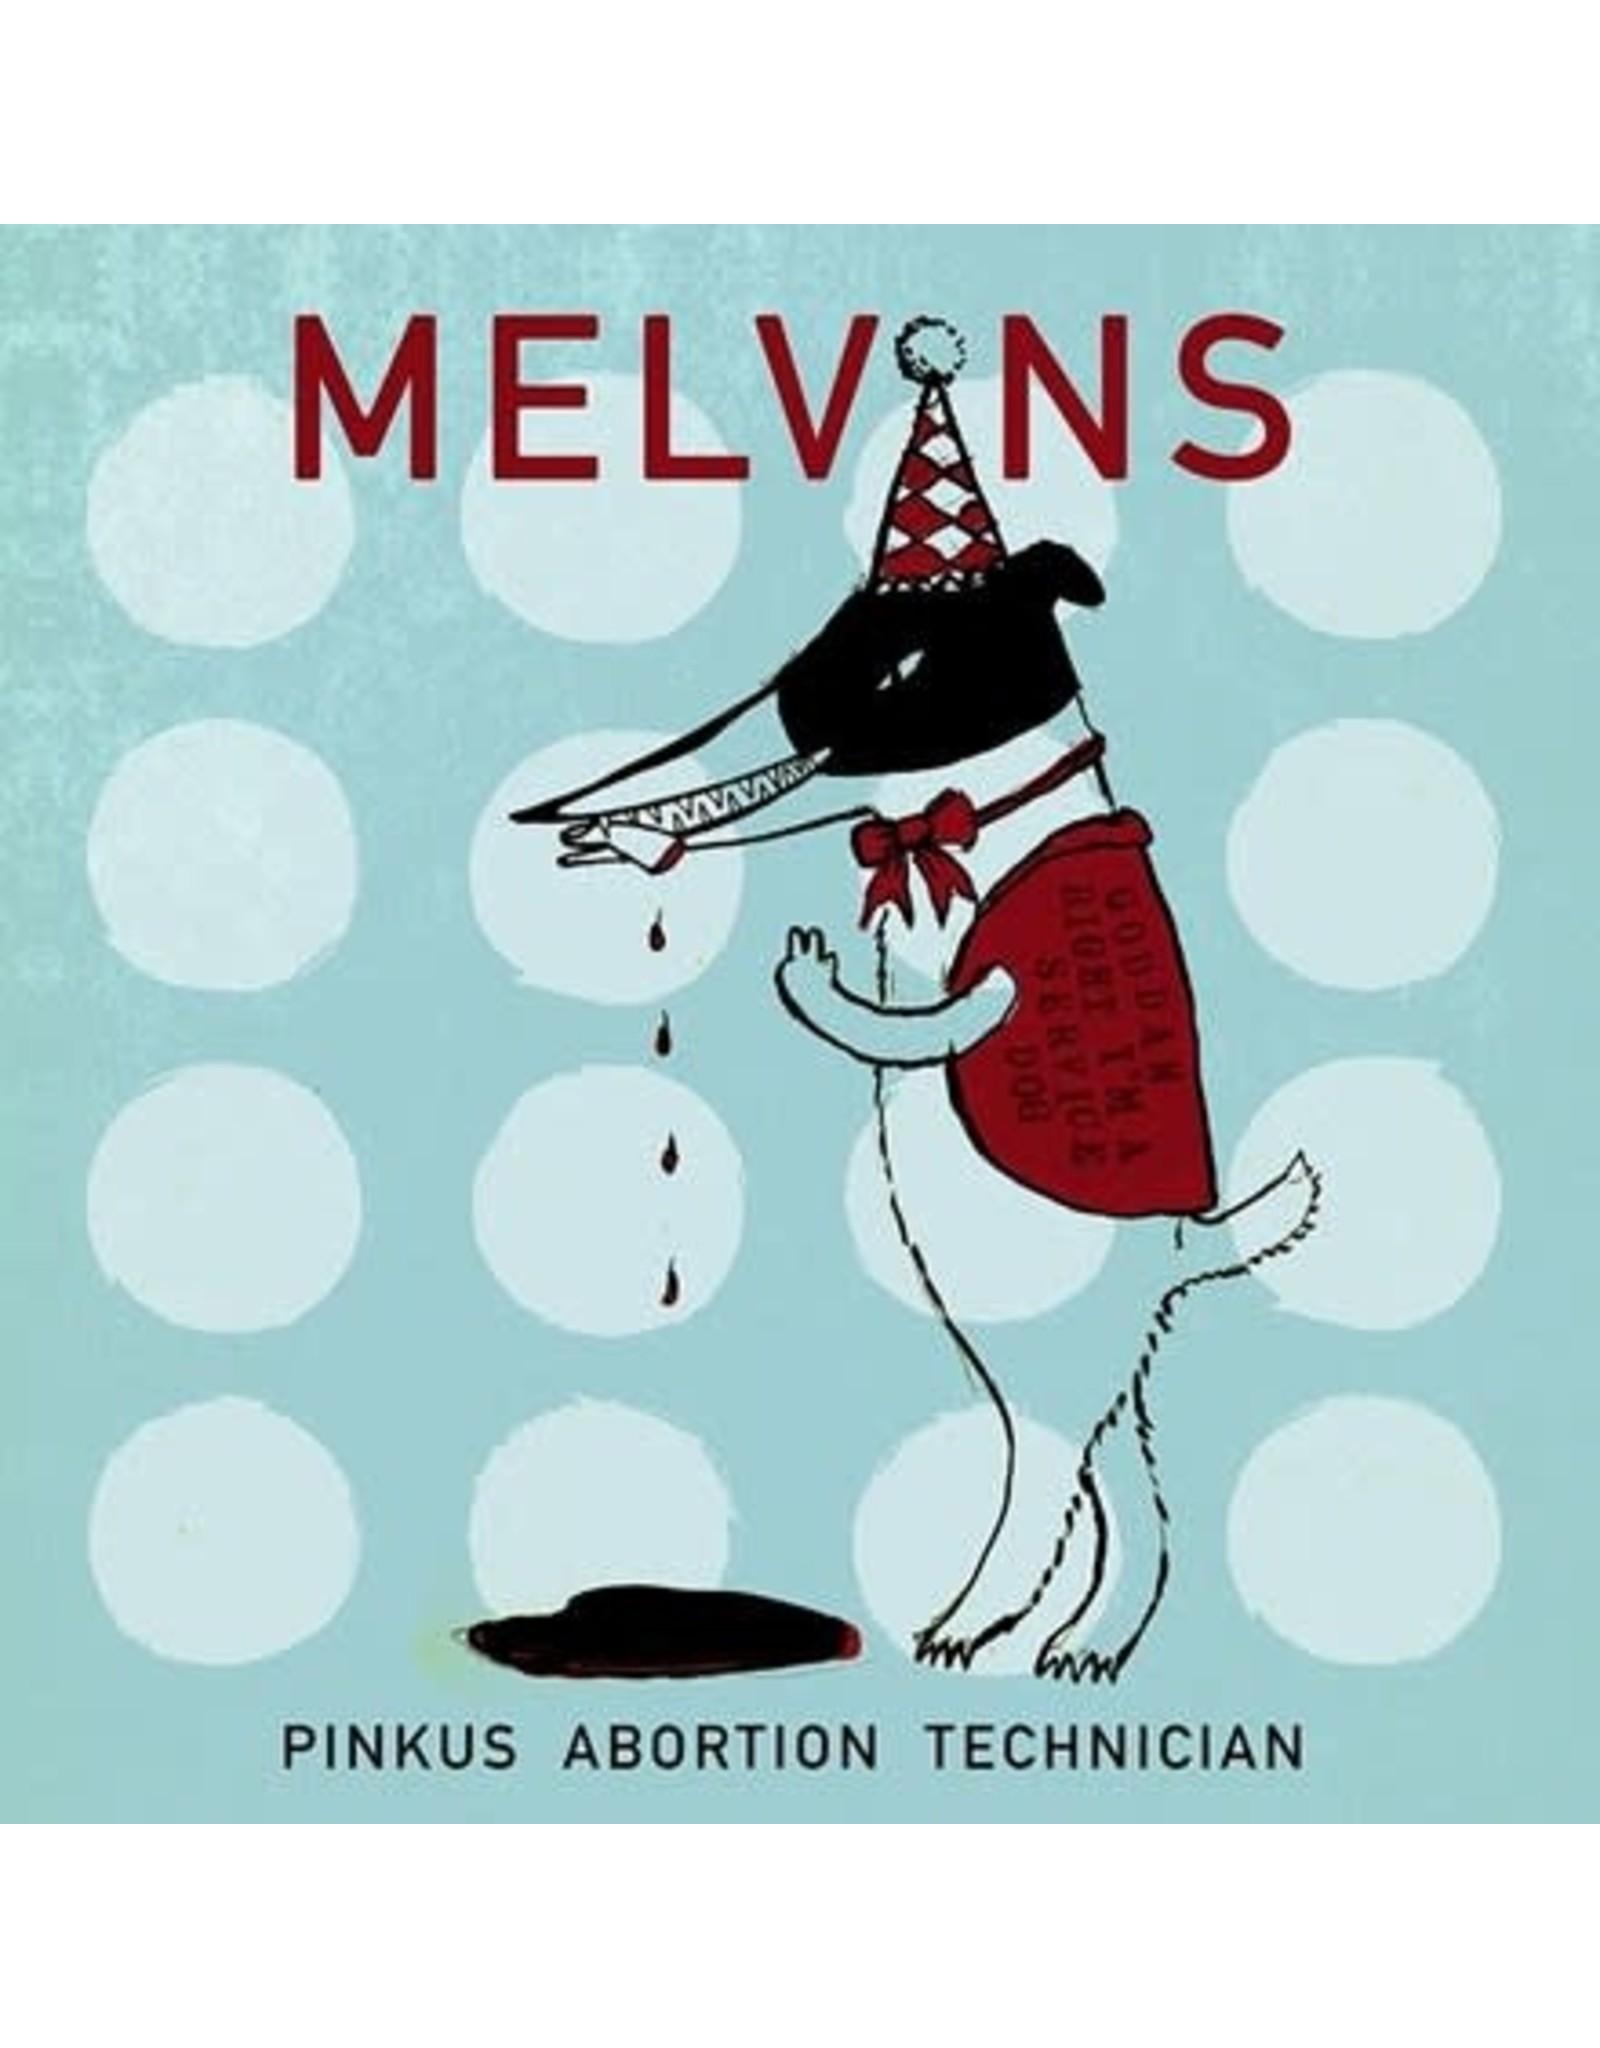 Ipecac Melvins: Pinkus Abortion Technician LP